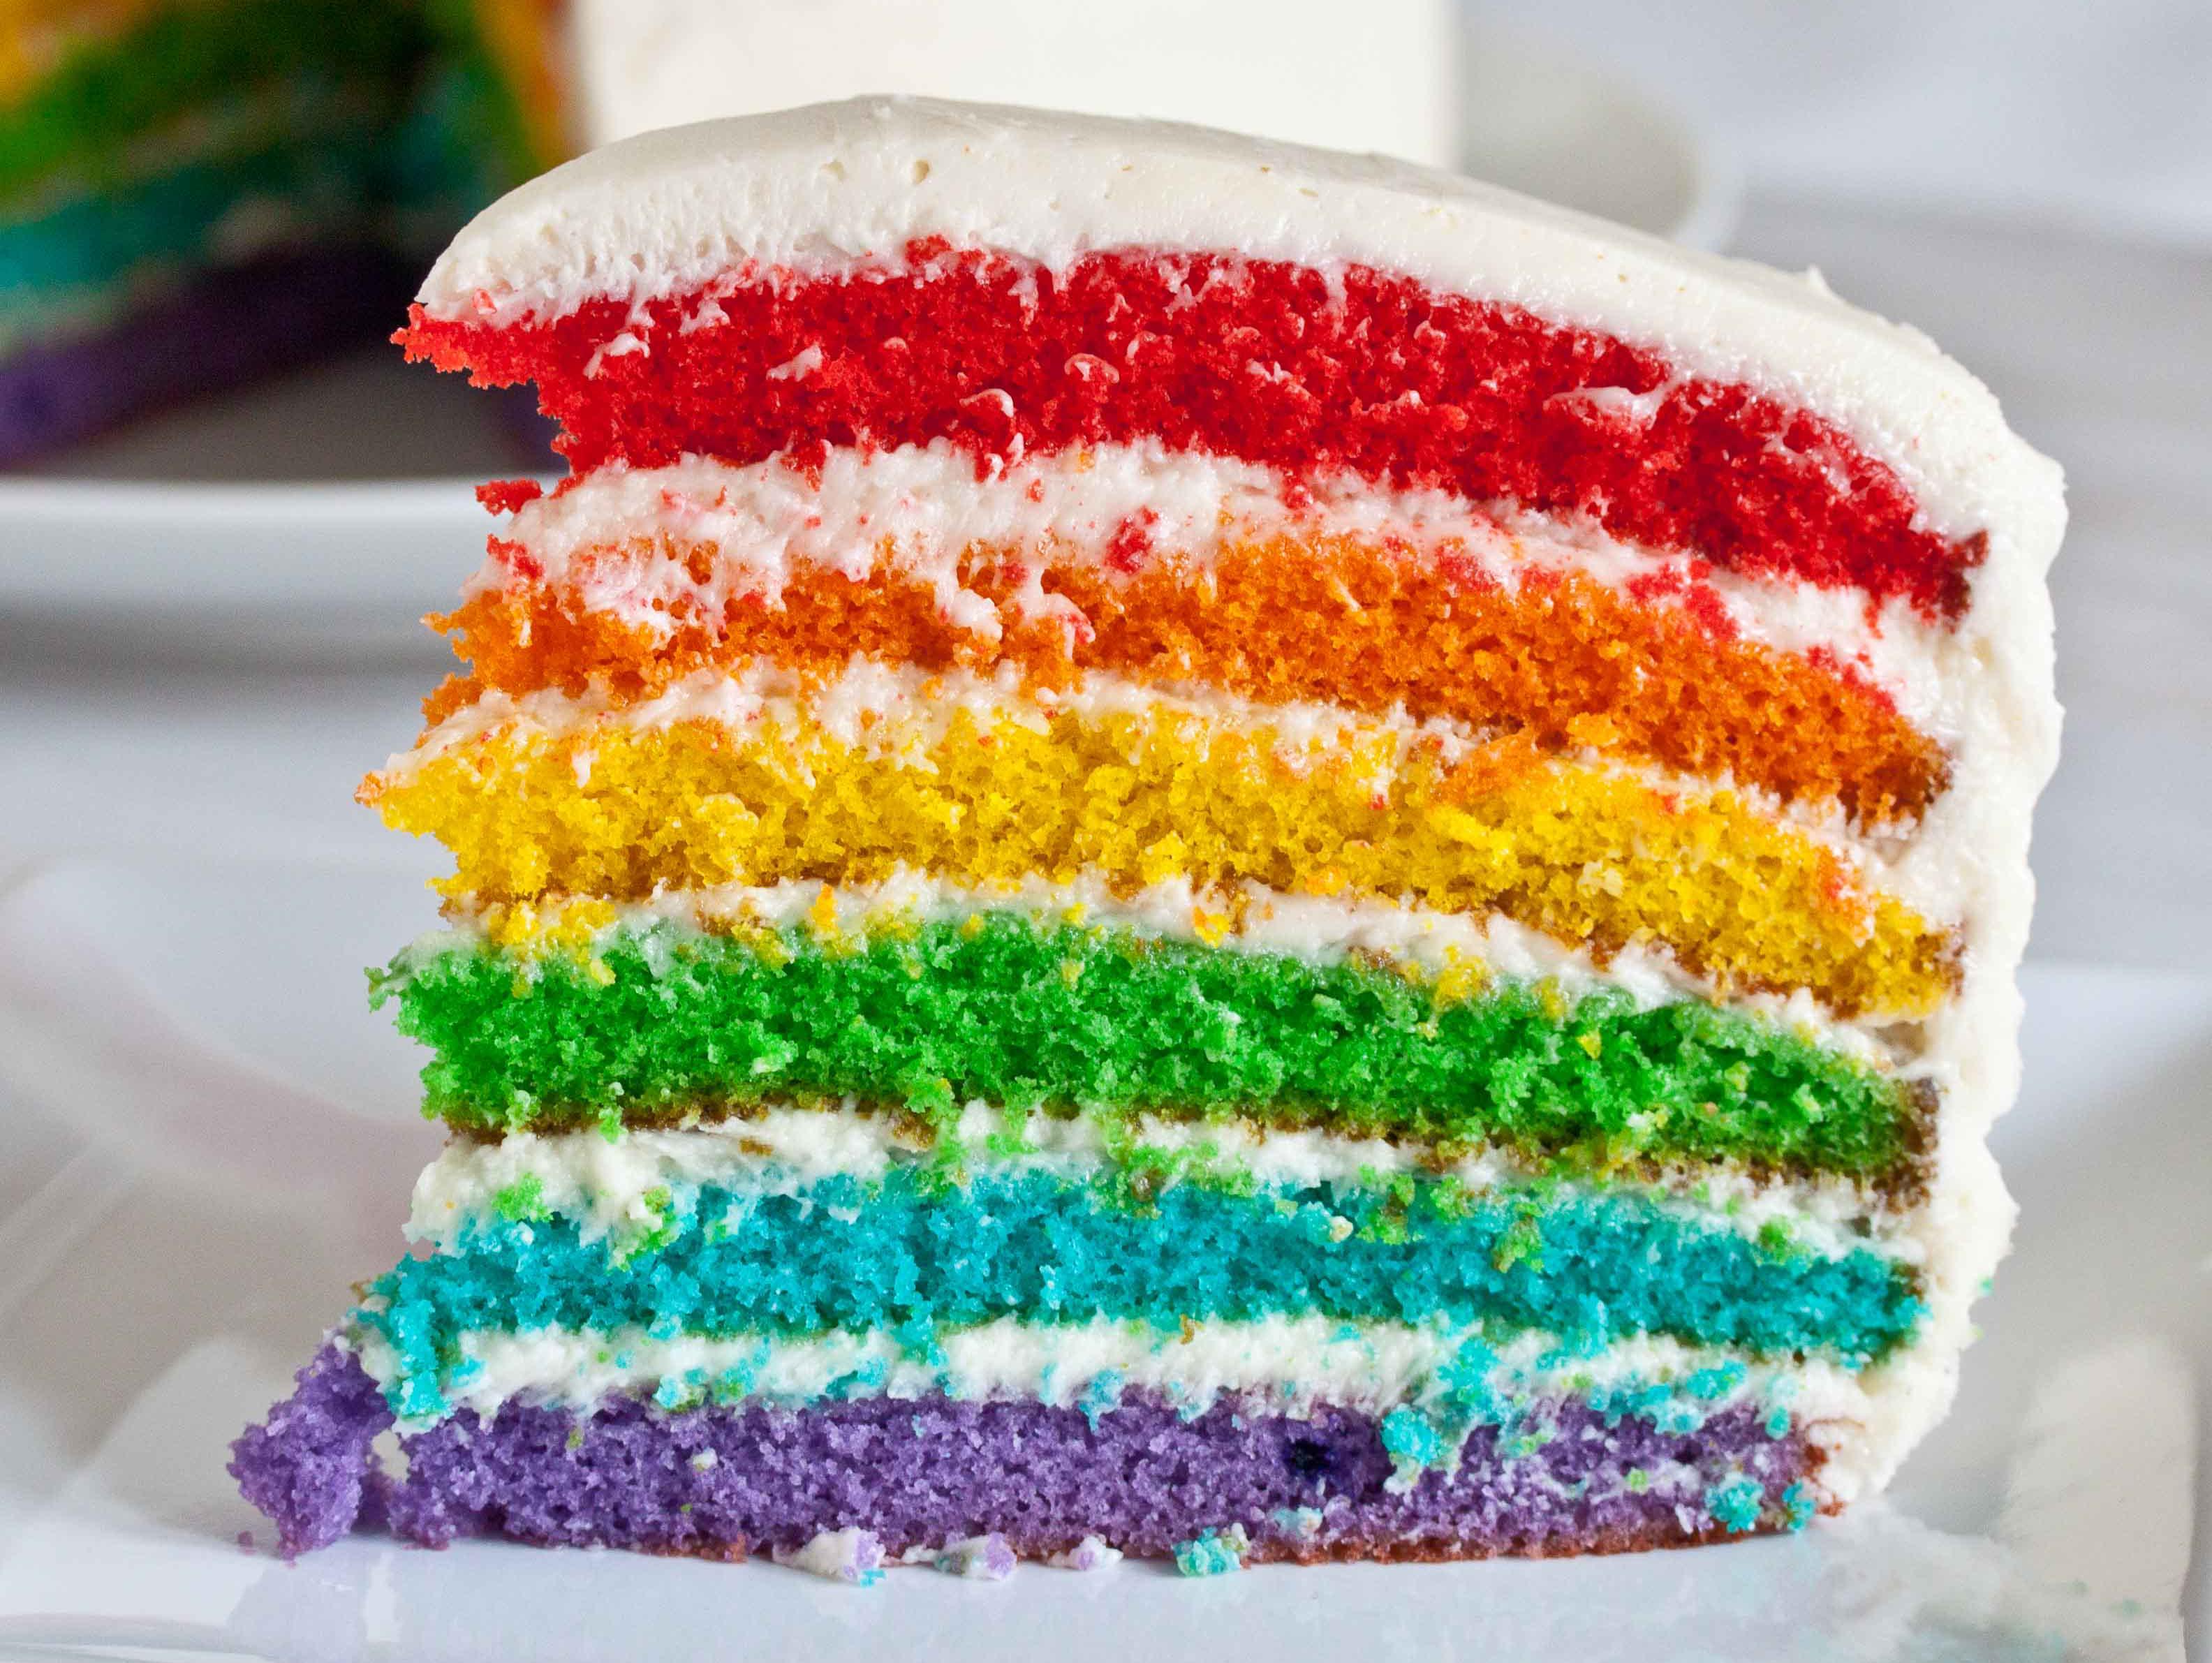 http://interdecor22.ru/wp-content/uploads/2016/01/cake-tort-sloy-cvet-raduga.jpg